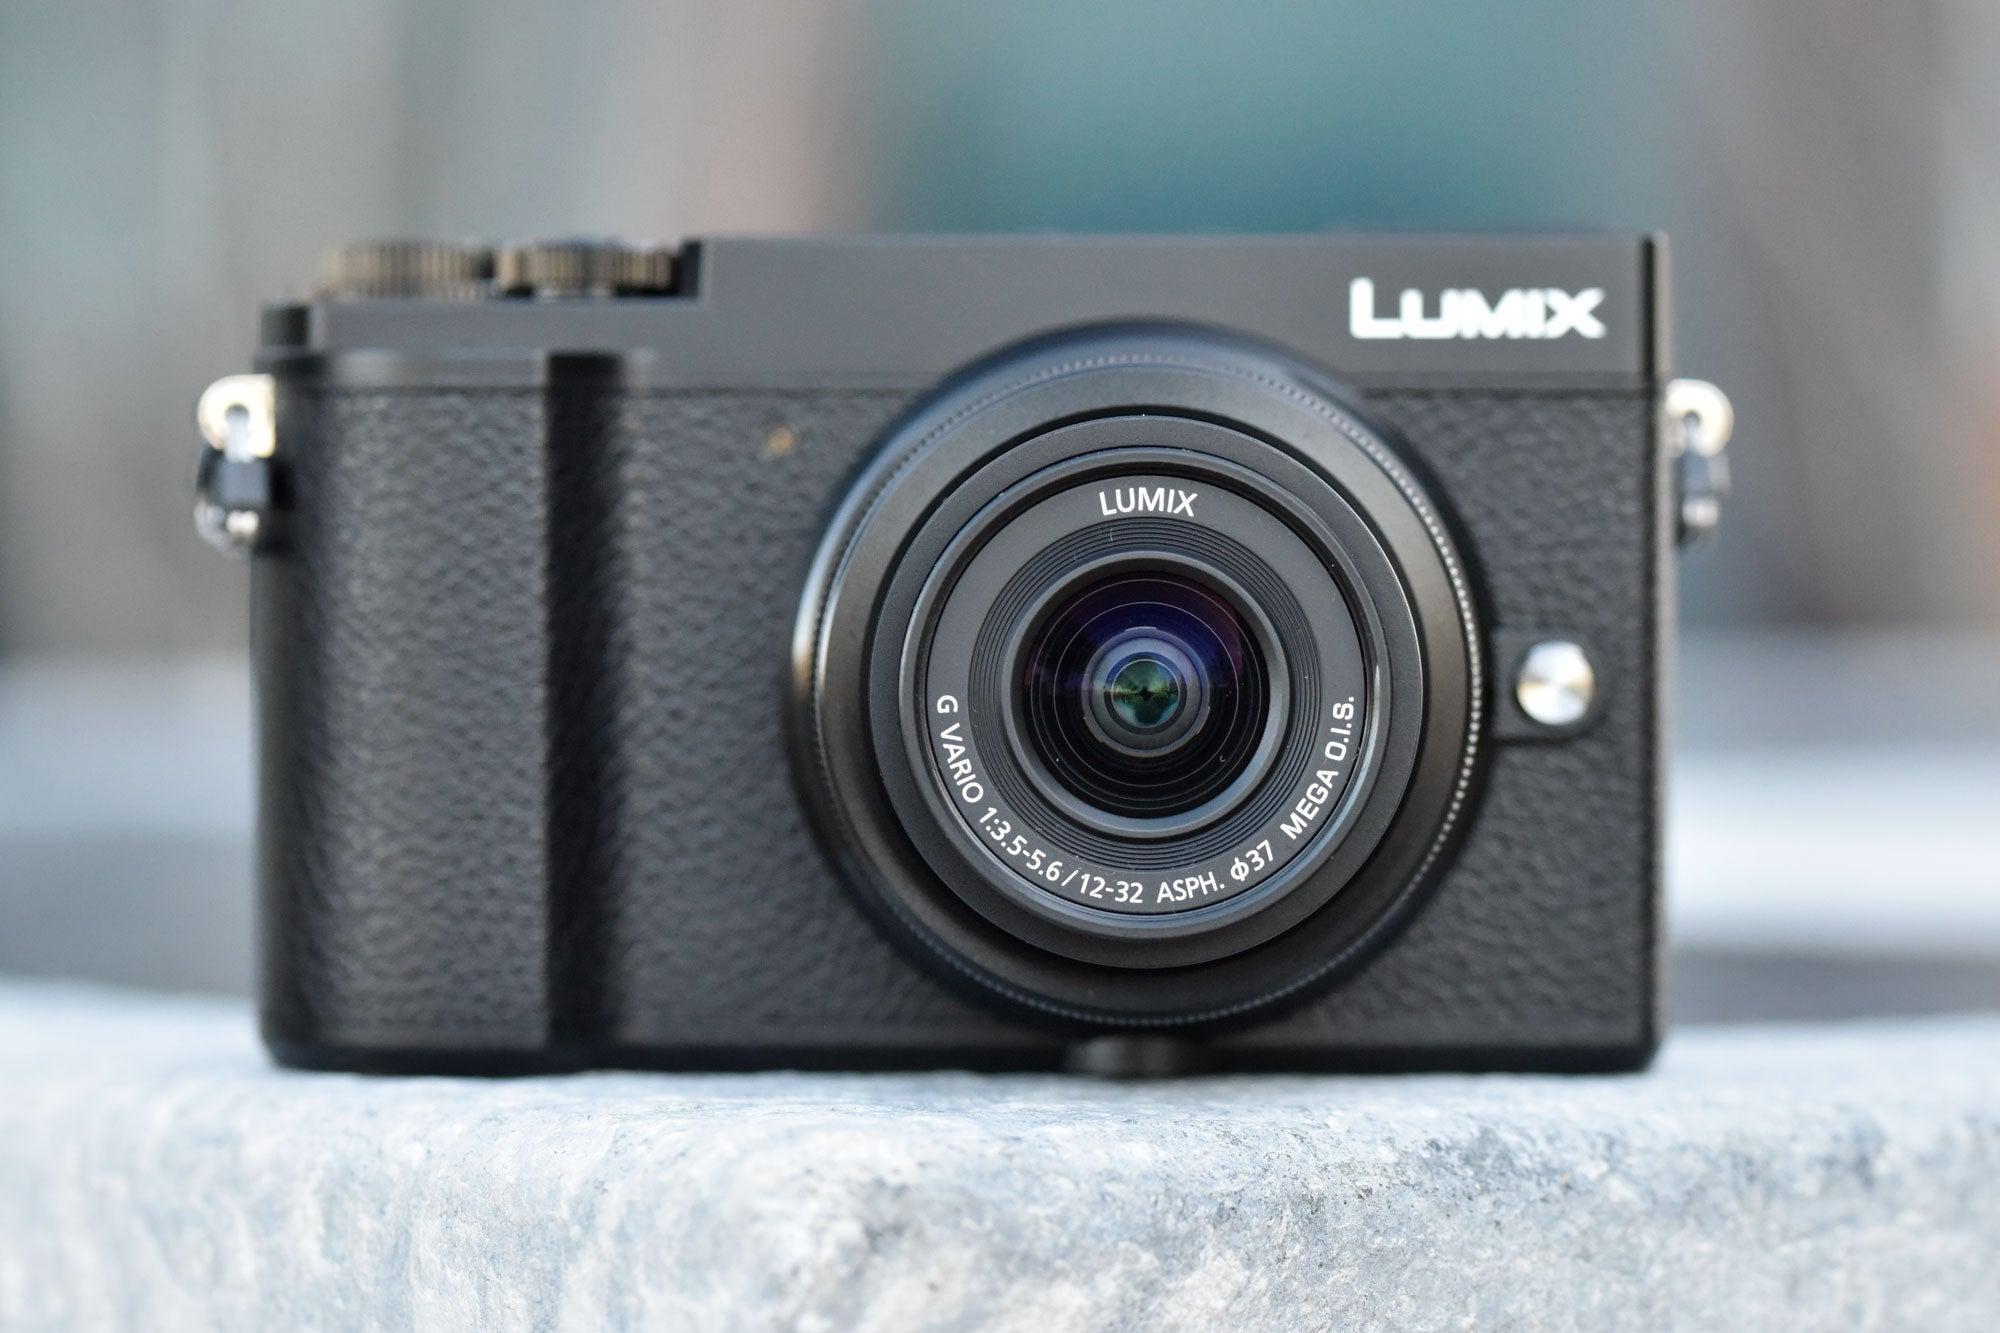 Jual Panasonic Lumix Dmc Gx85 Kit 12 32mm Silver Kamera Mirrorless Black Hitam Gx9 Review Trusted Reviews Related Best